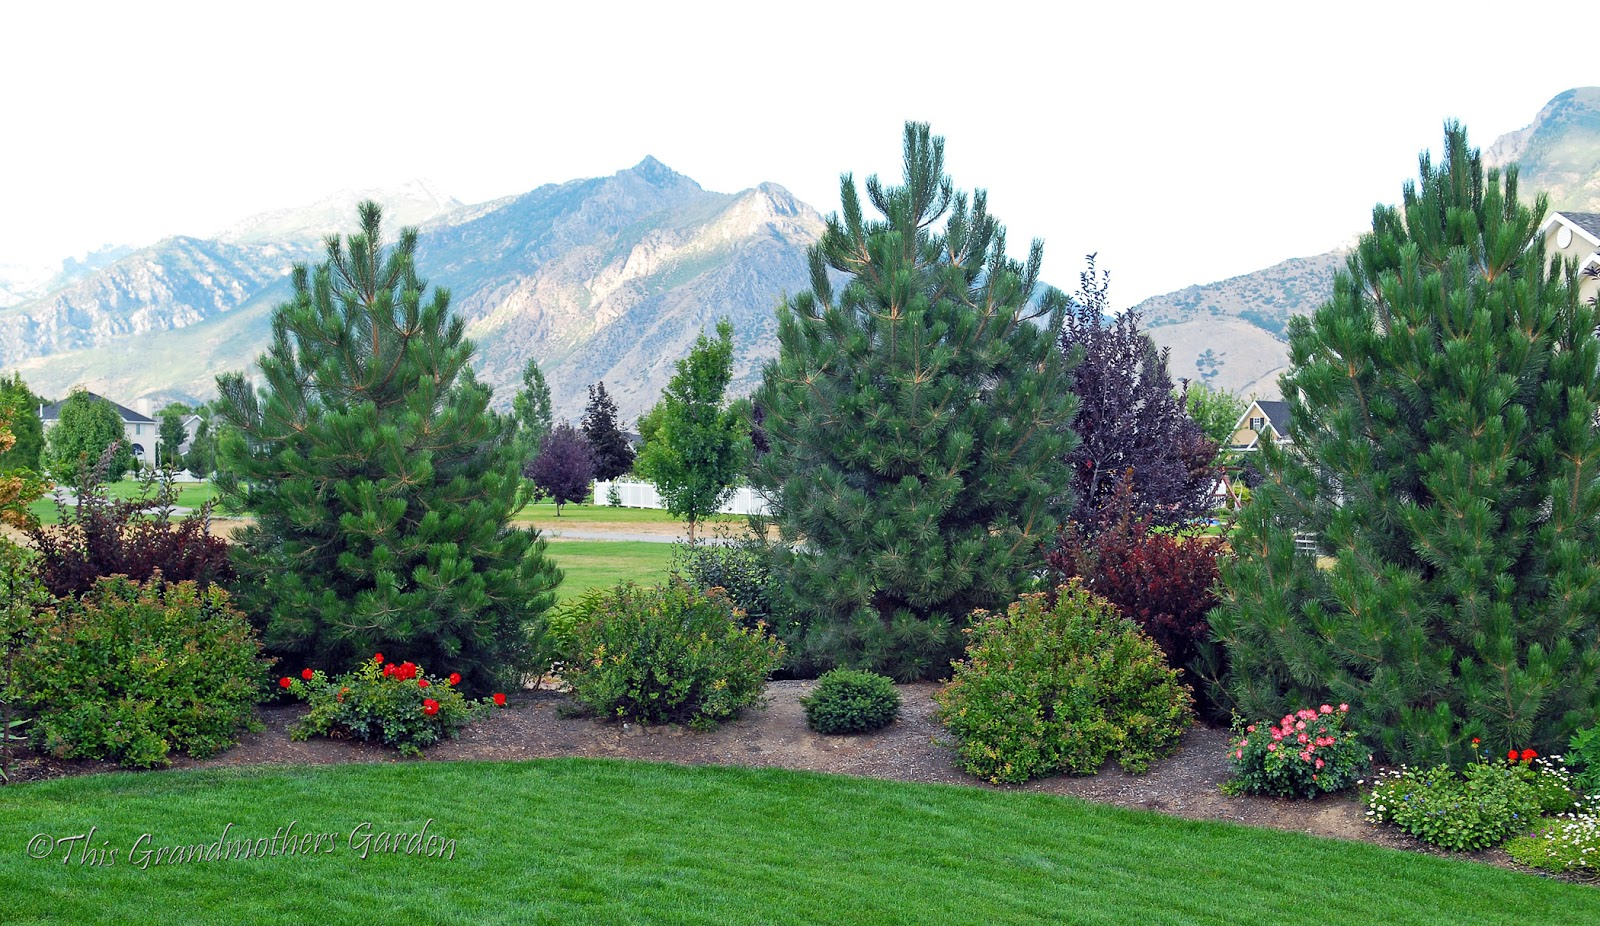 Mature austrian pine tree adult webcam movies for Mature pine trees